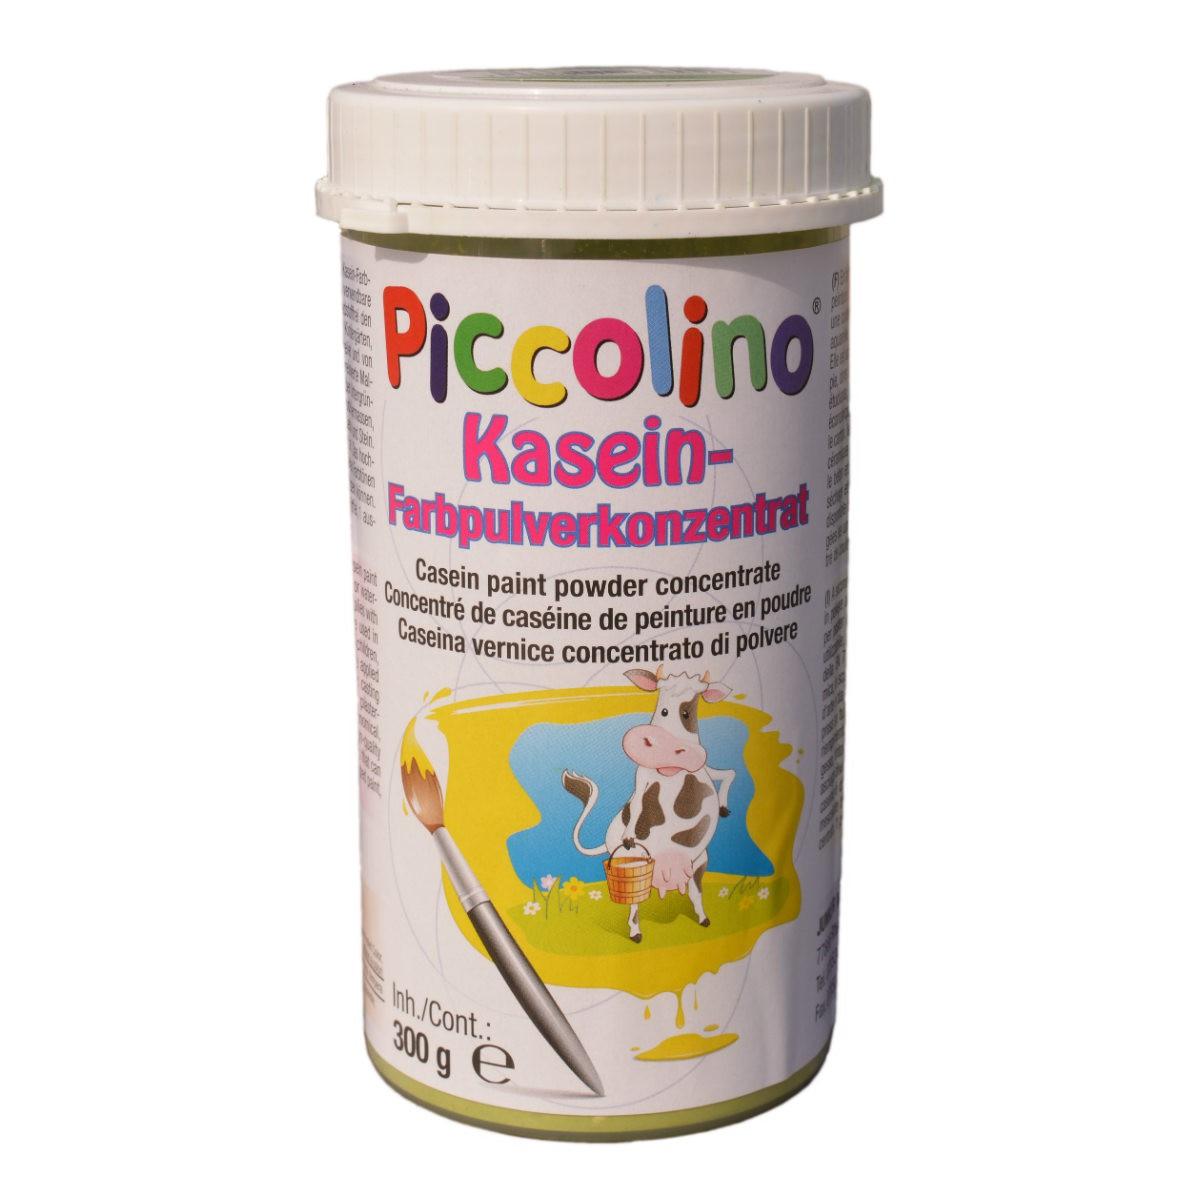 Plakatfarbe Piccolino Kaseinfarbe 300g hellrot - Farbpulver zum Selbstanrühren